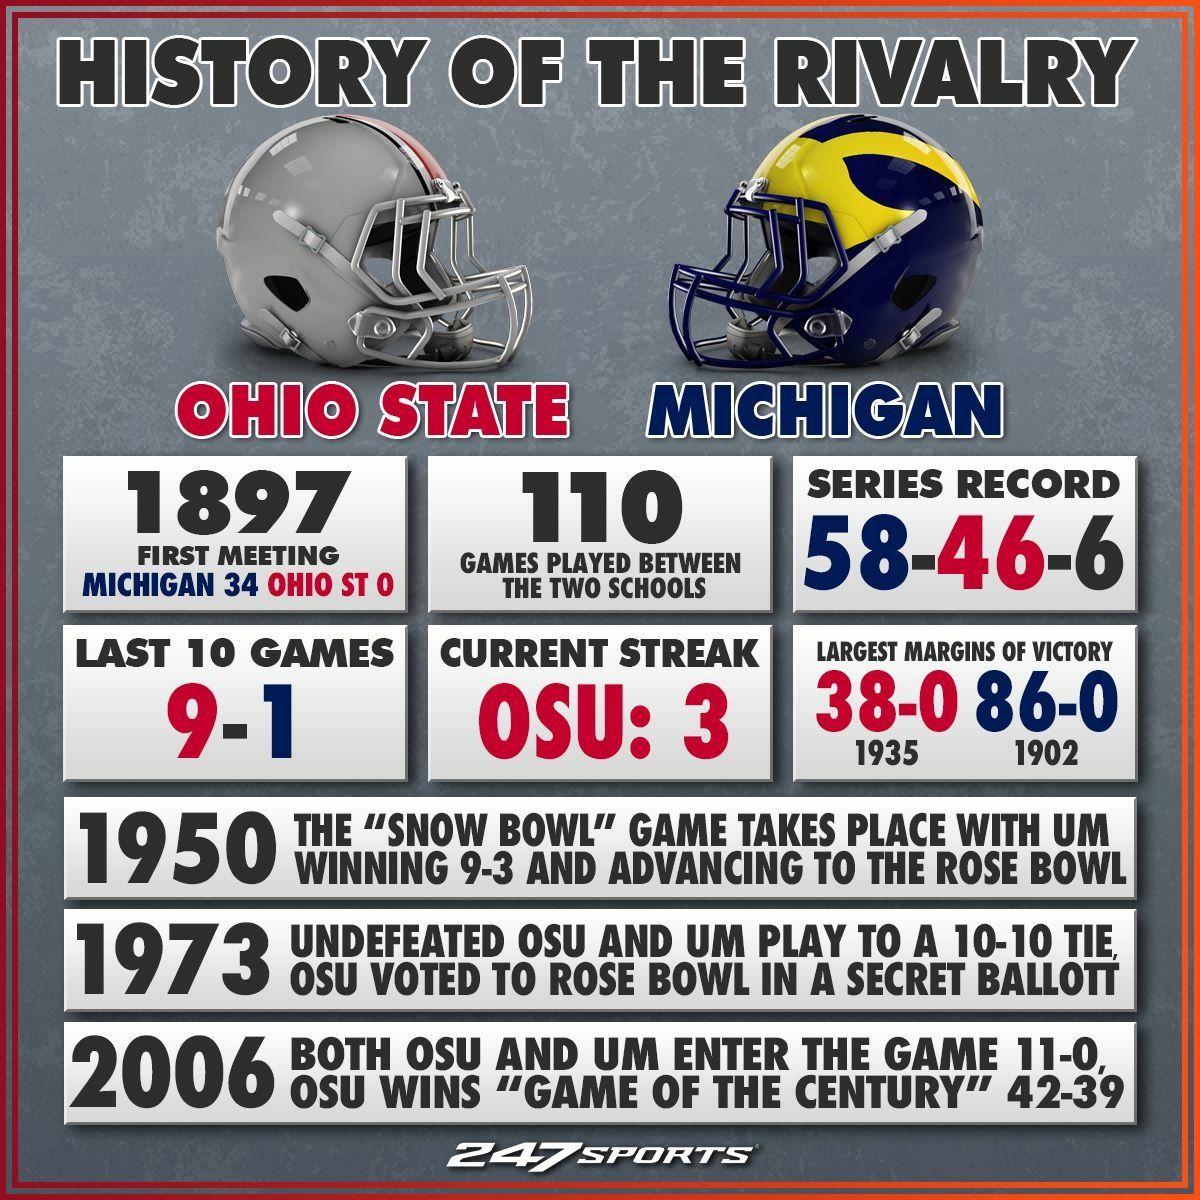 Pin By Martha Hall On Buckeyes Ohio State Michigan Ohio State Michigan Rivalry Michigan